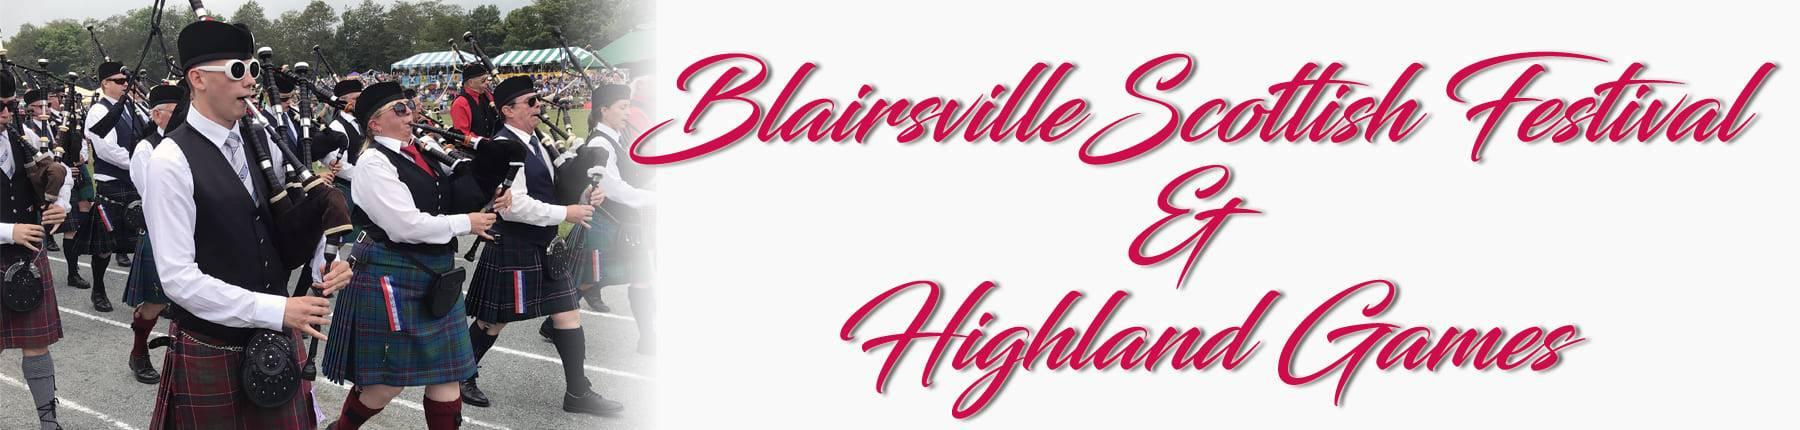 Blairsville Scottish Festival